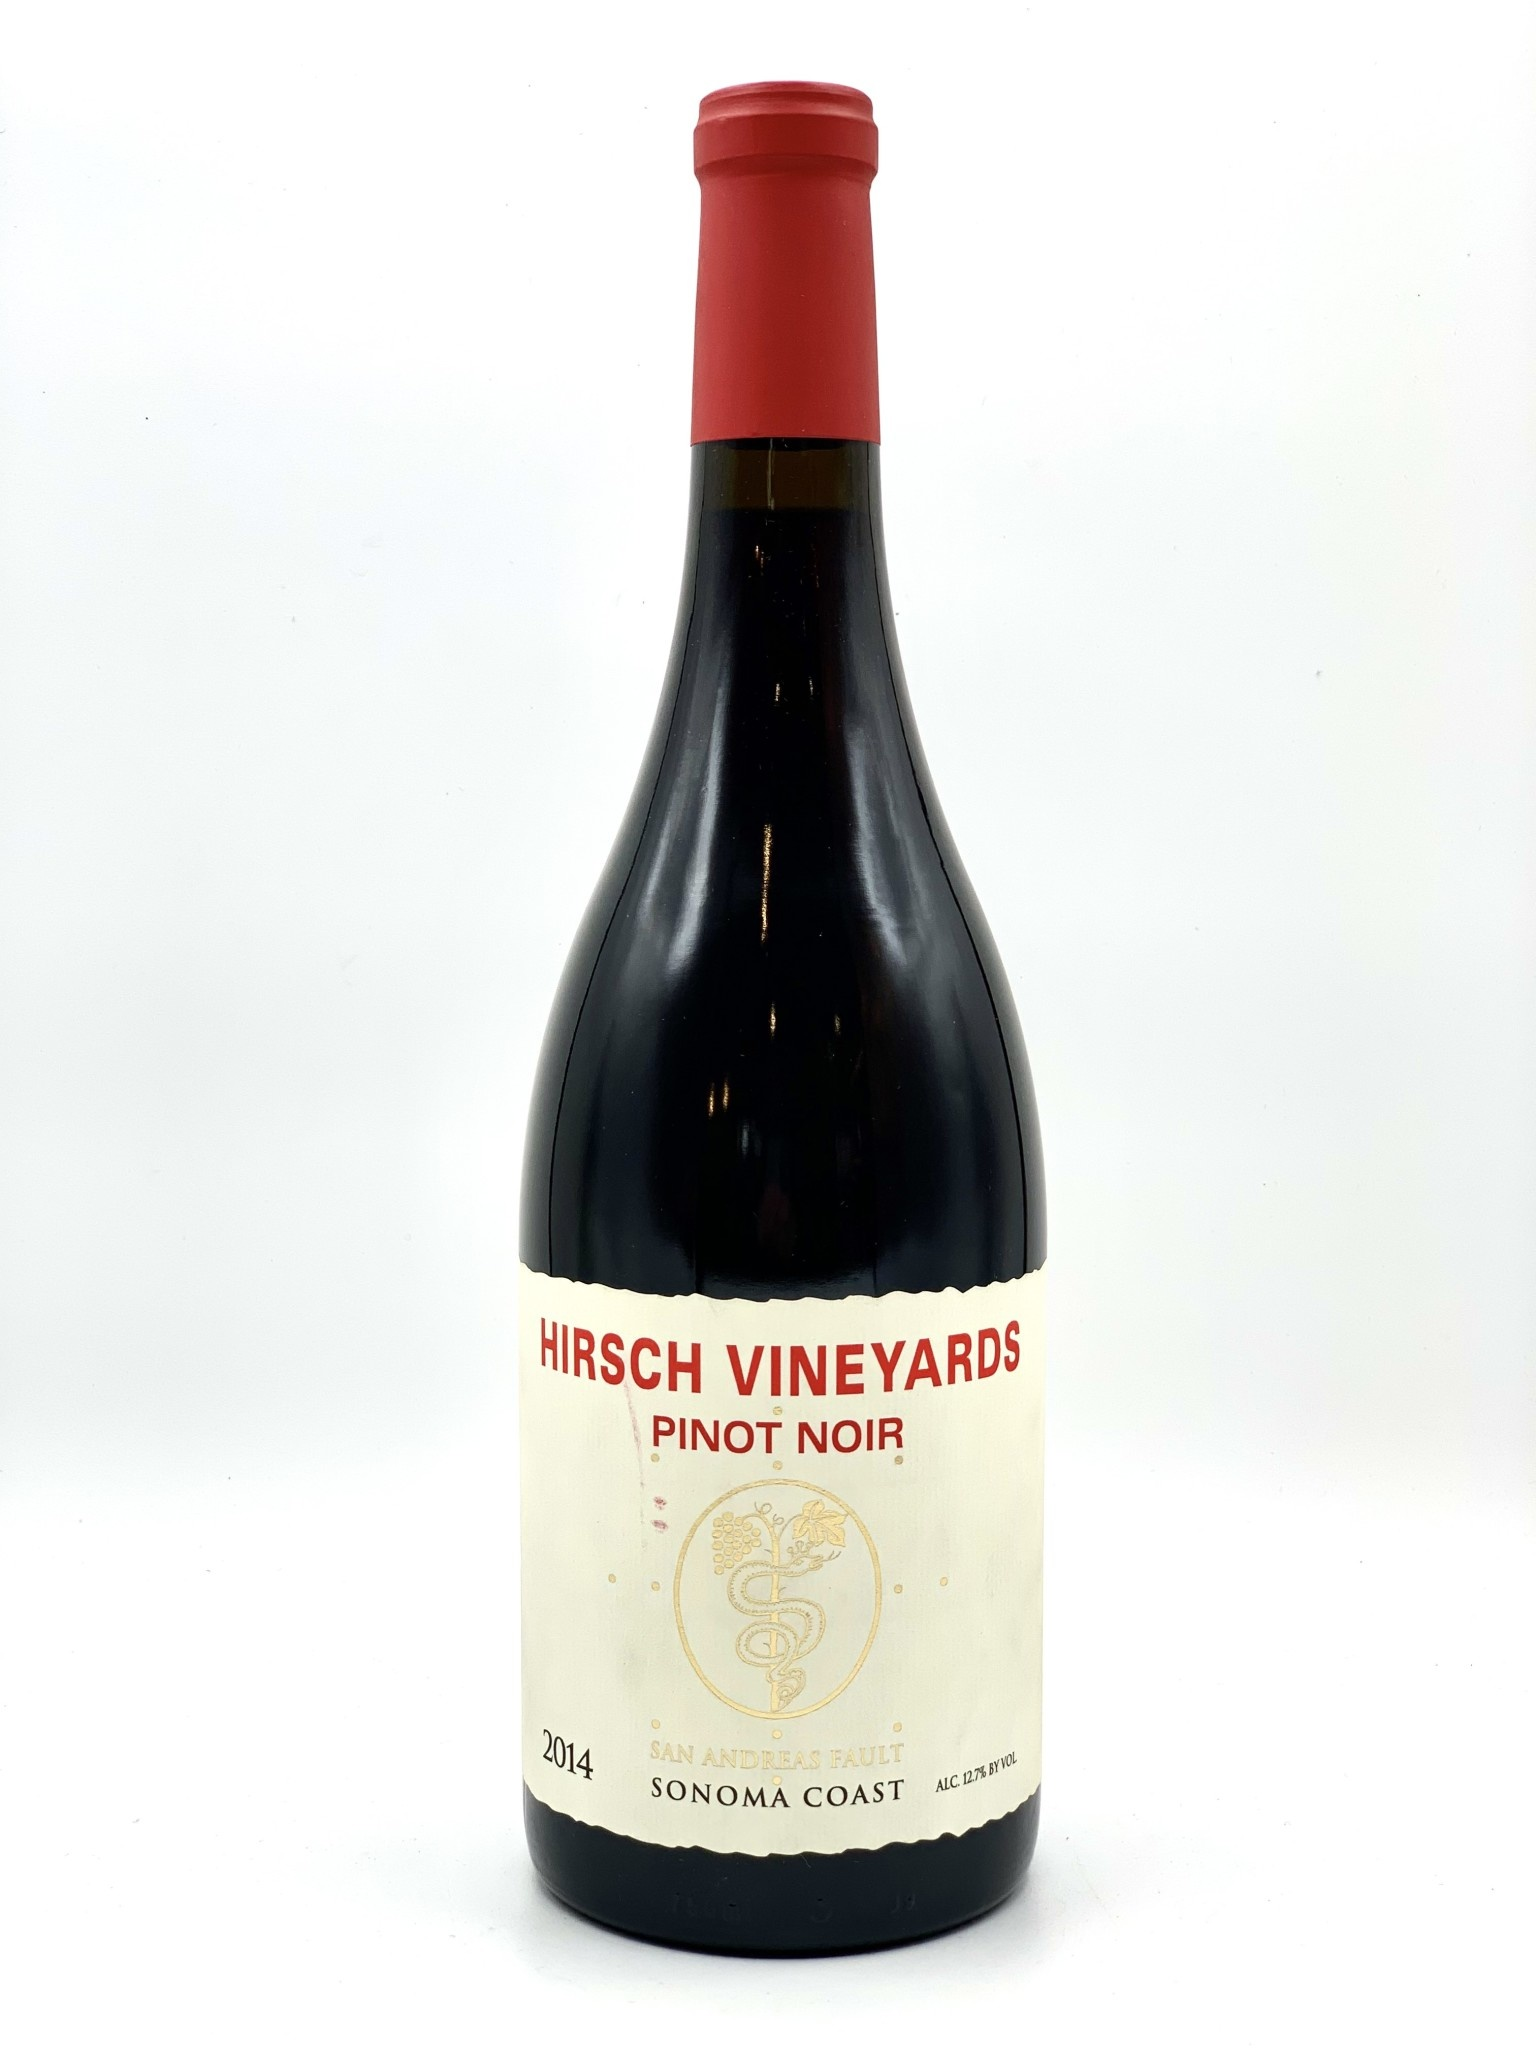 Sonoma Coast San Andreas Fault Pinot Noir 2016 Hirsch Vineyards 750ml